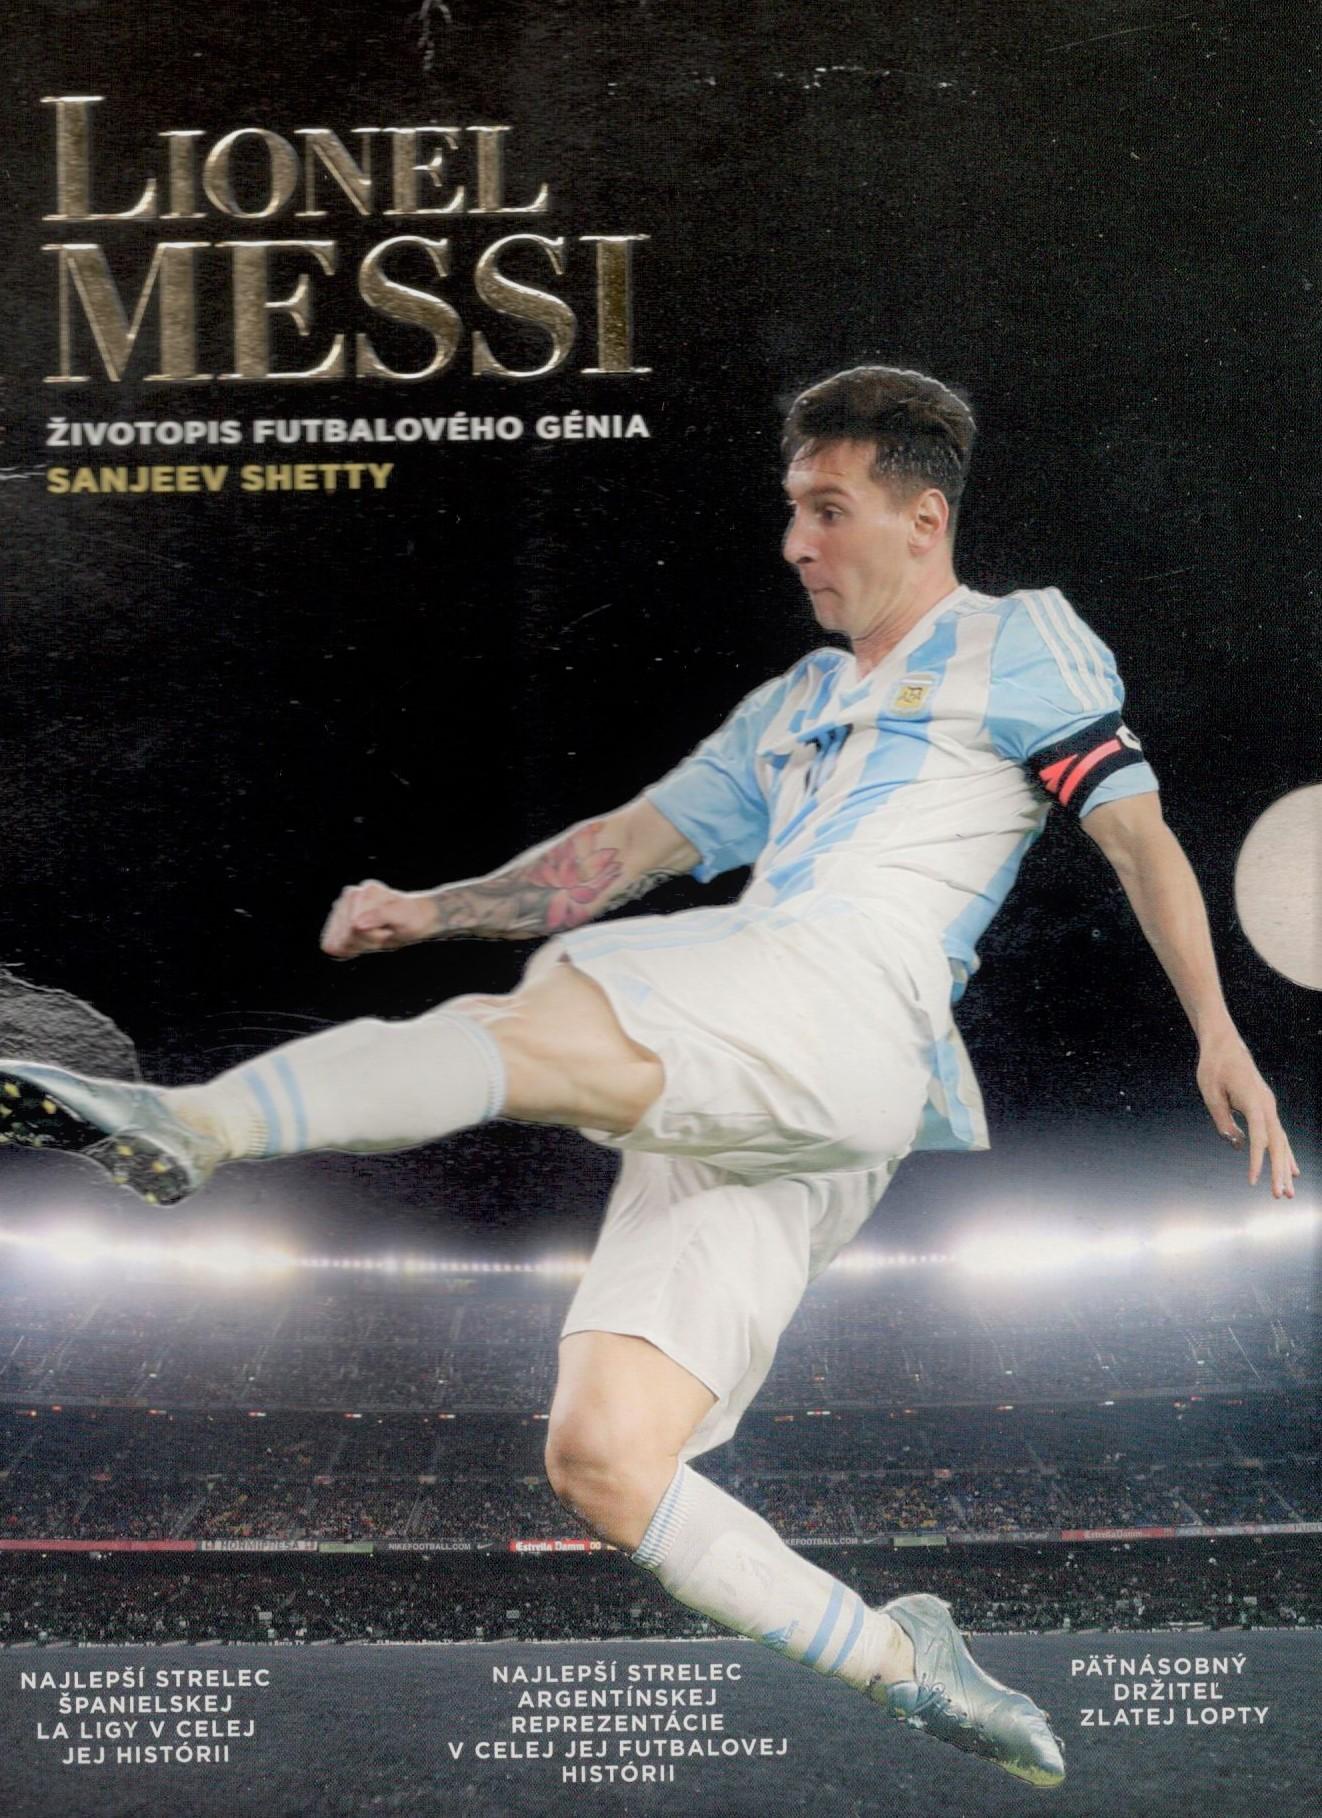 Lionel Messi - Životopis futbalového génia